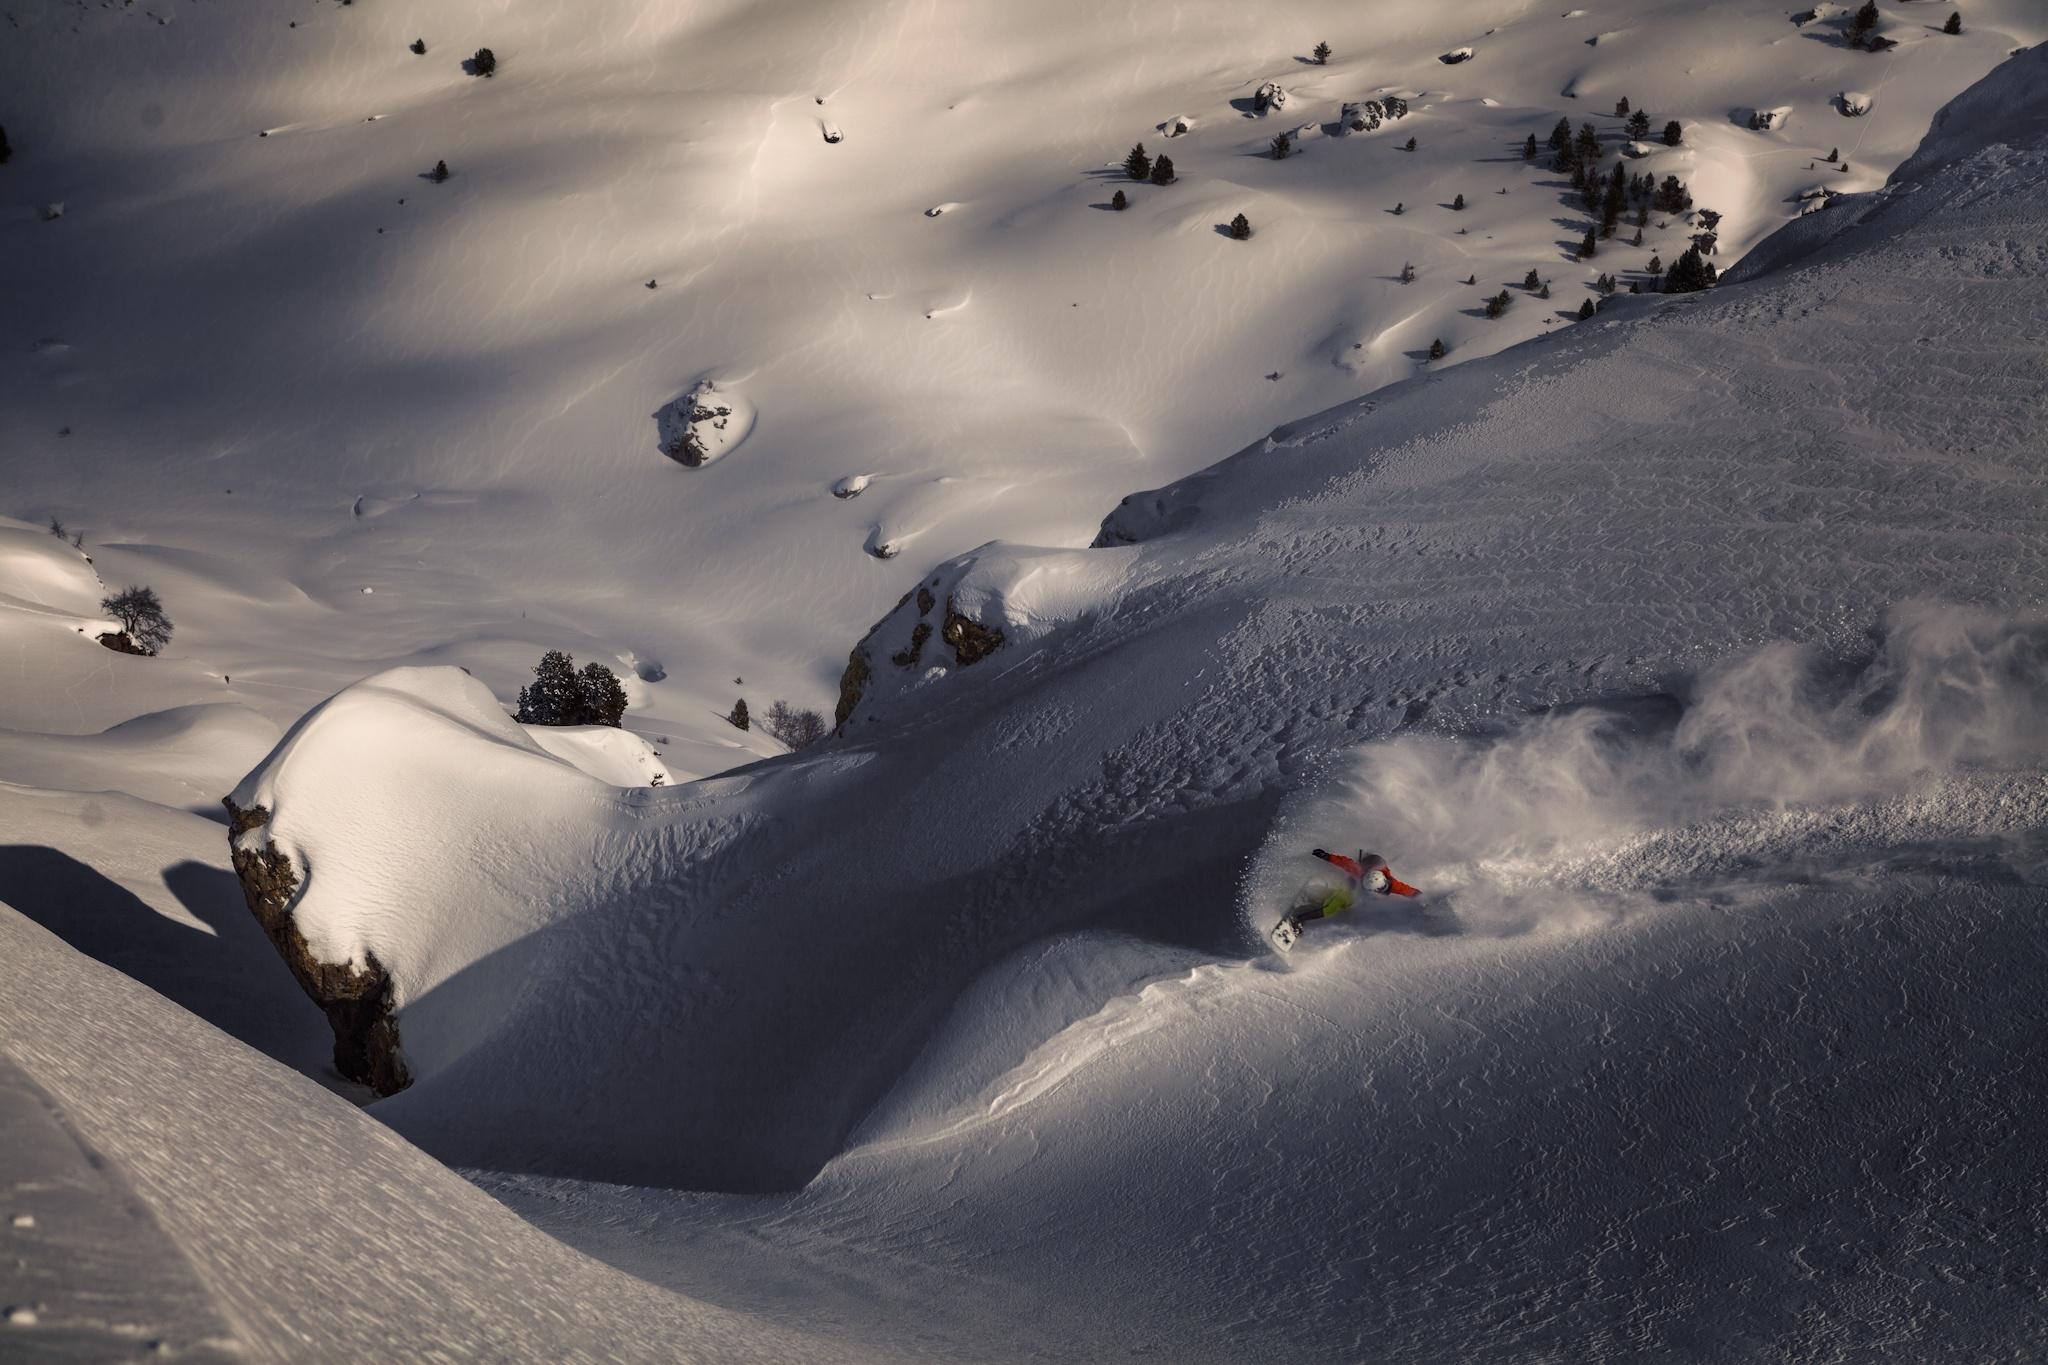 Loma Verde, Ekaitz Isasi - Ski & Snowboard - Fotos del Valle del Aragón, Mikel Besga